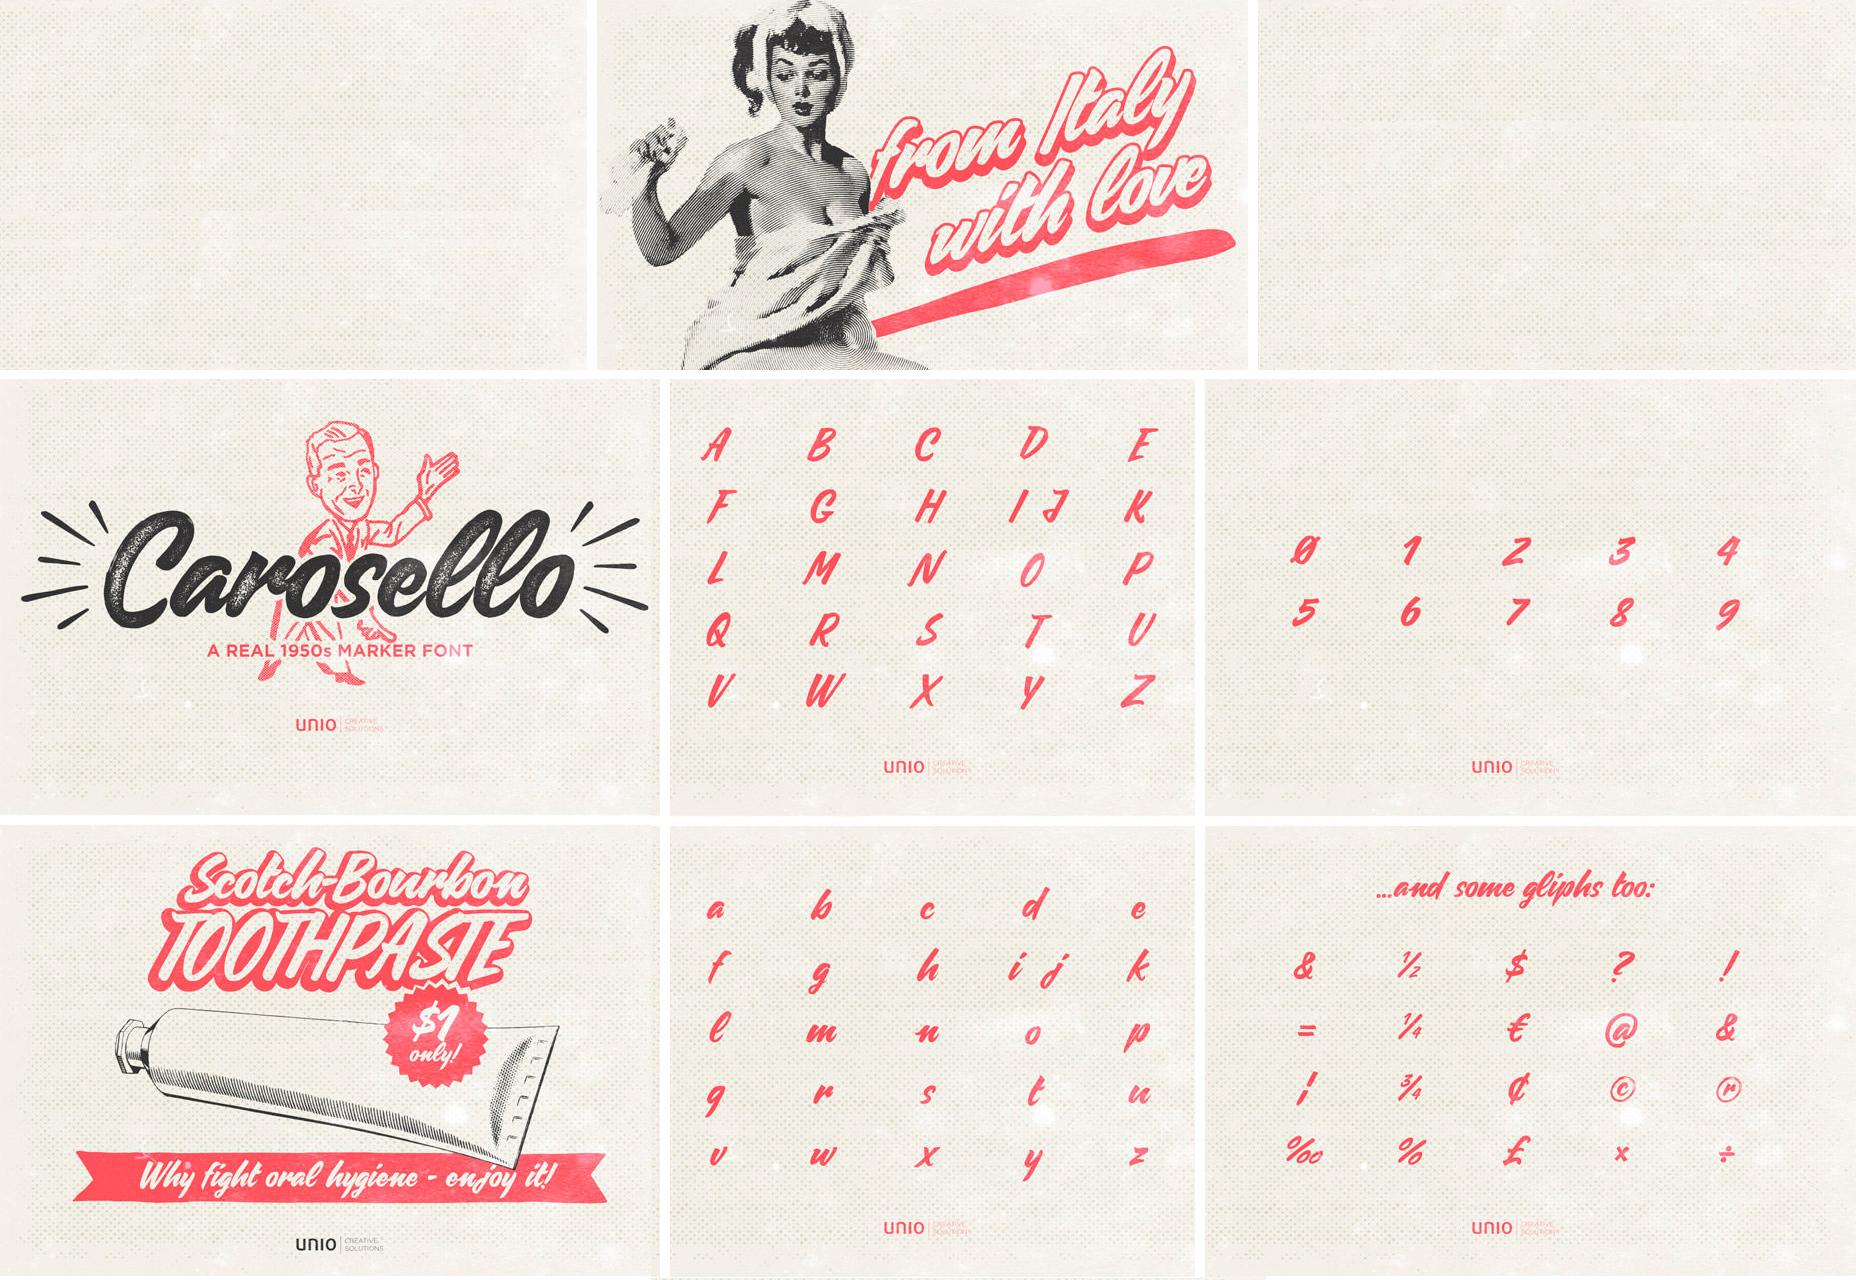 Carosello: Vintage 50's Style Poster Script Font